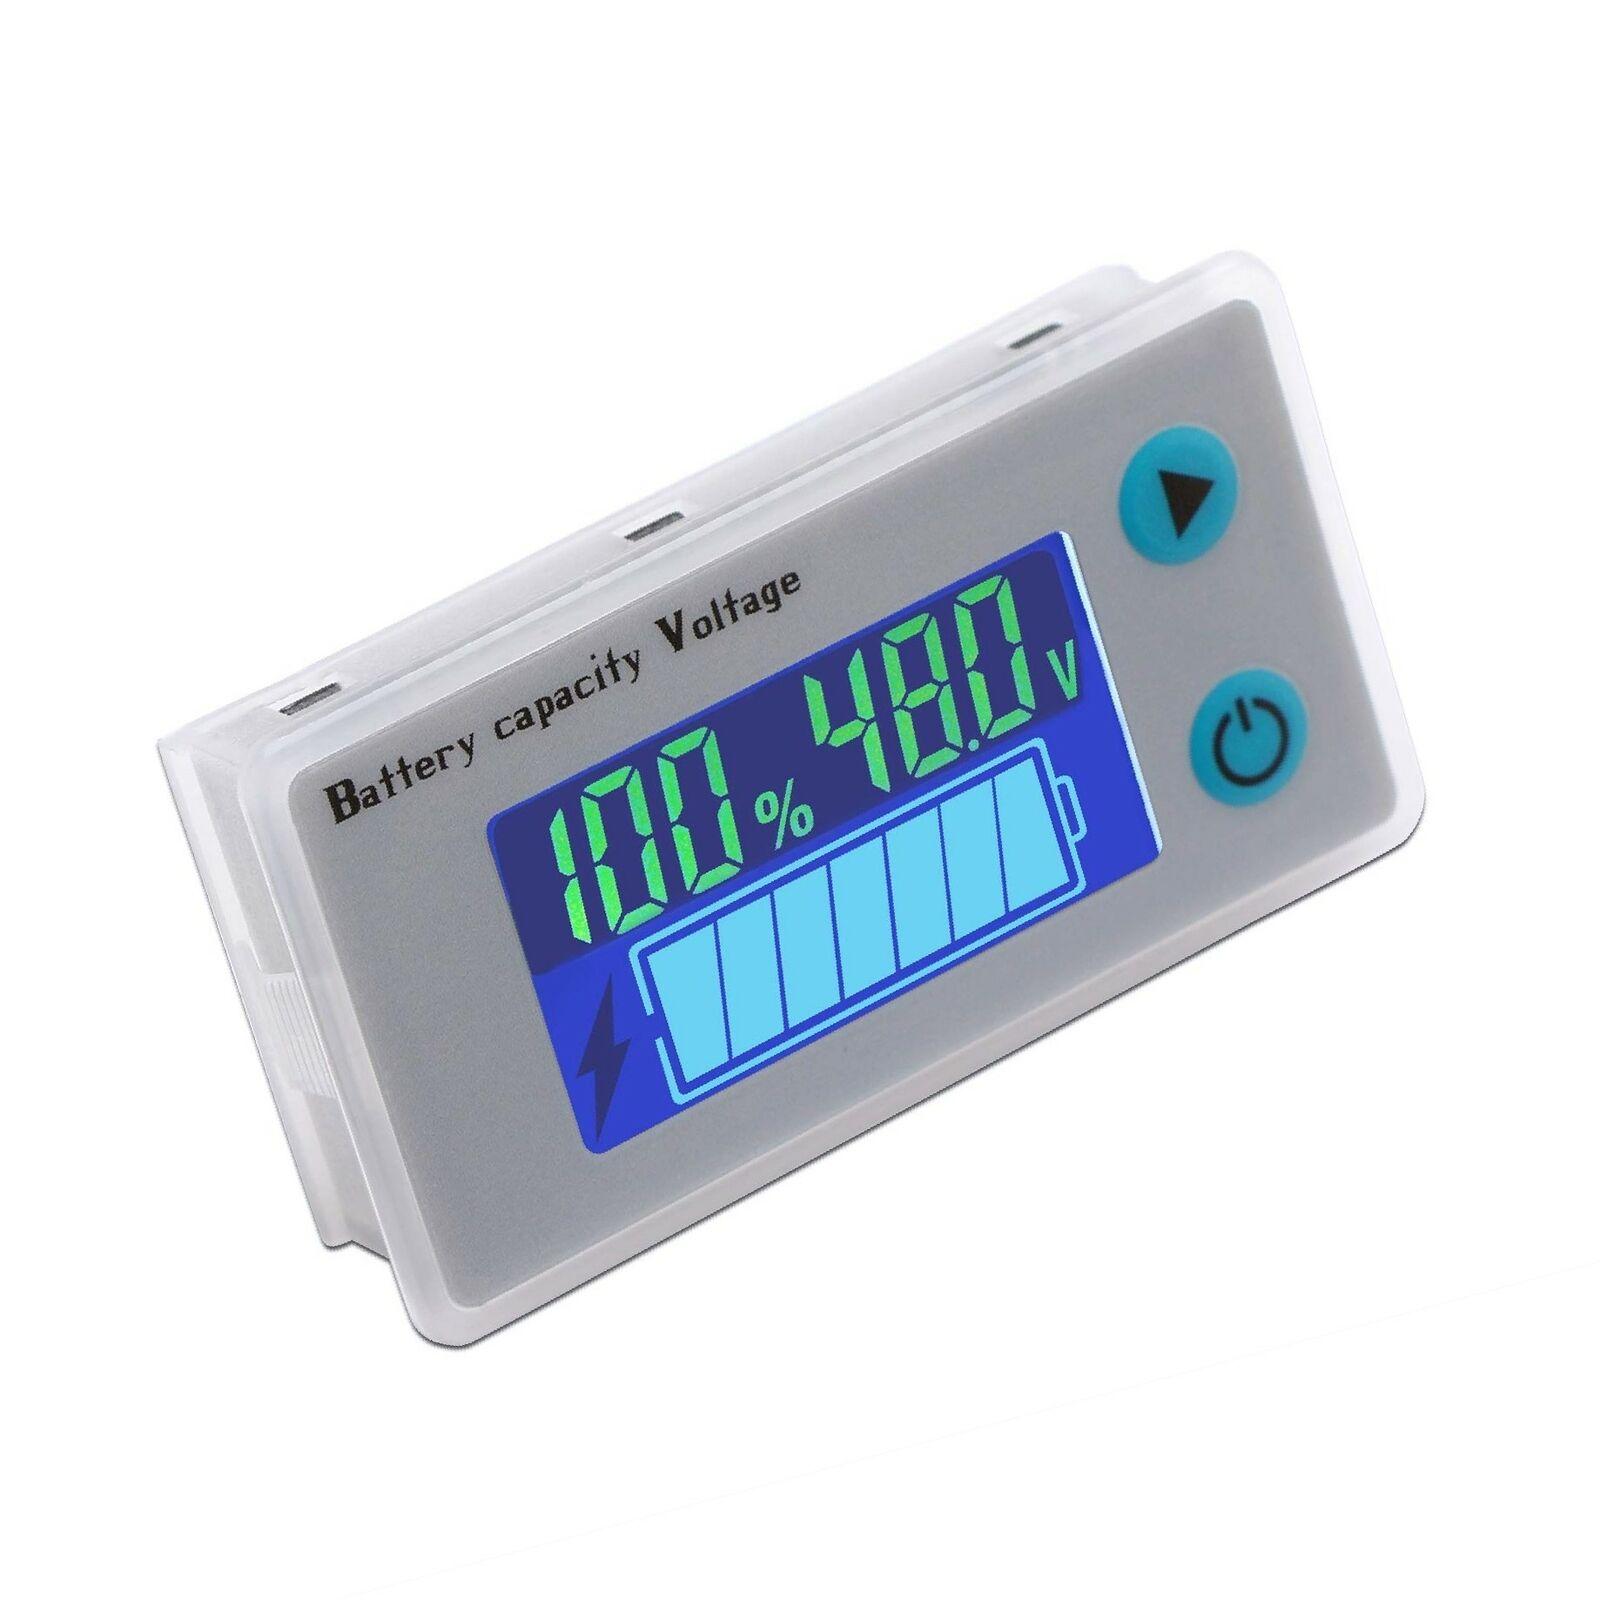 DROK Battery Meter, 48V Digital Battery Remaining Capacity Percentage Level V...